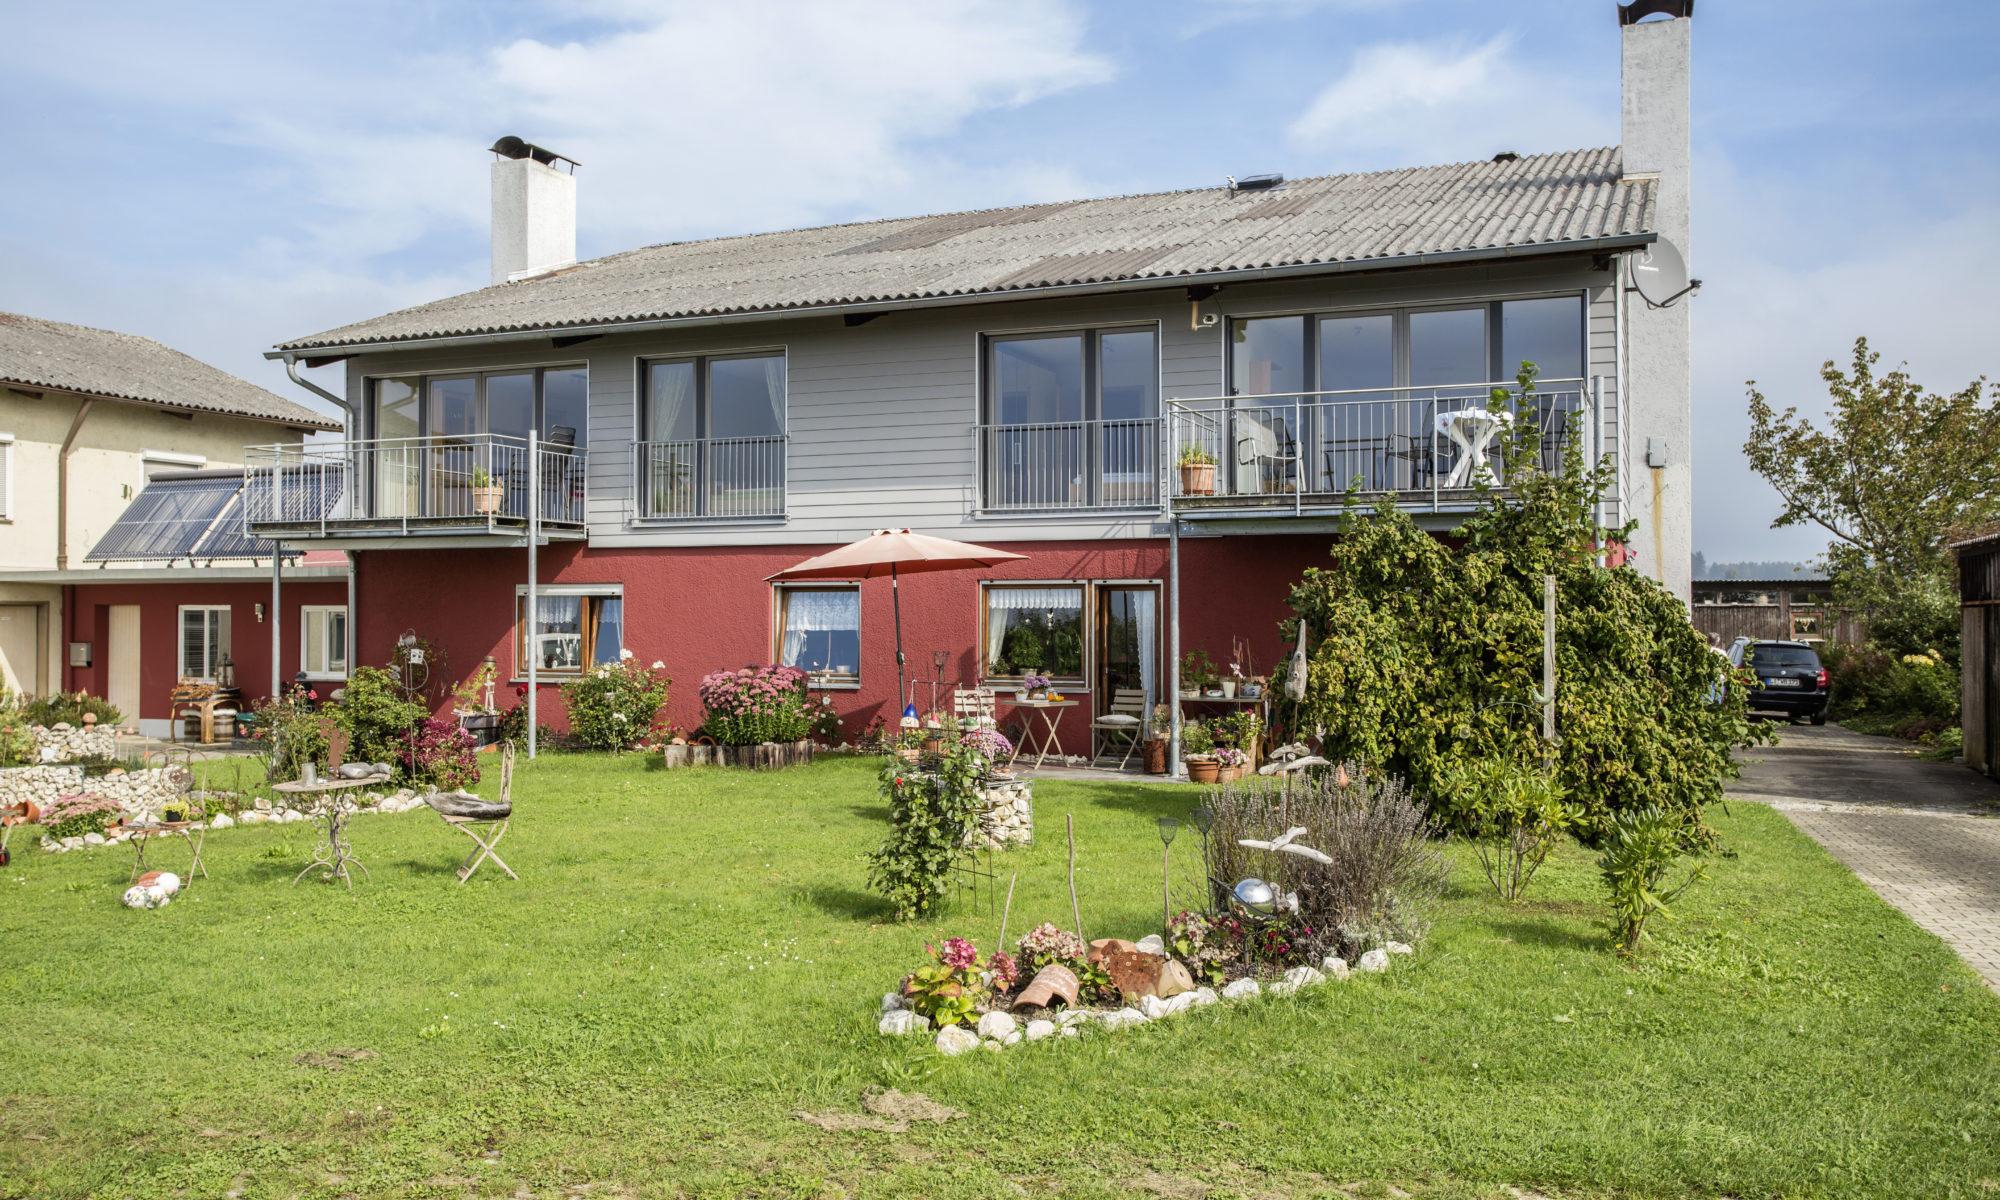 Haus Berle, Nonnenhorn